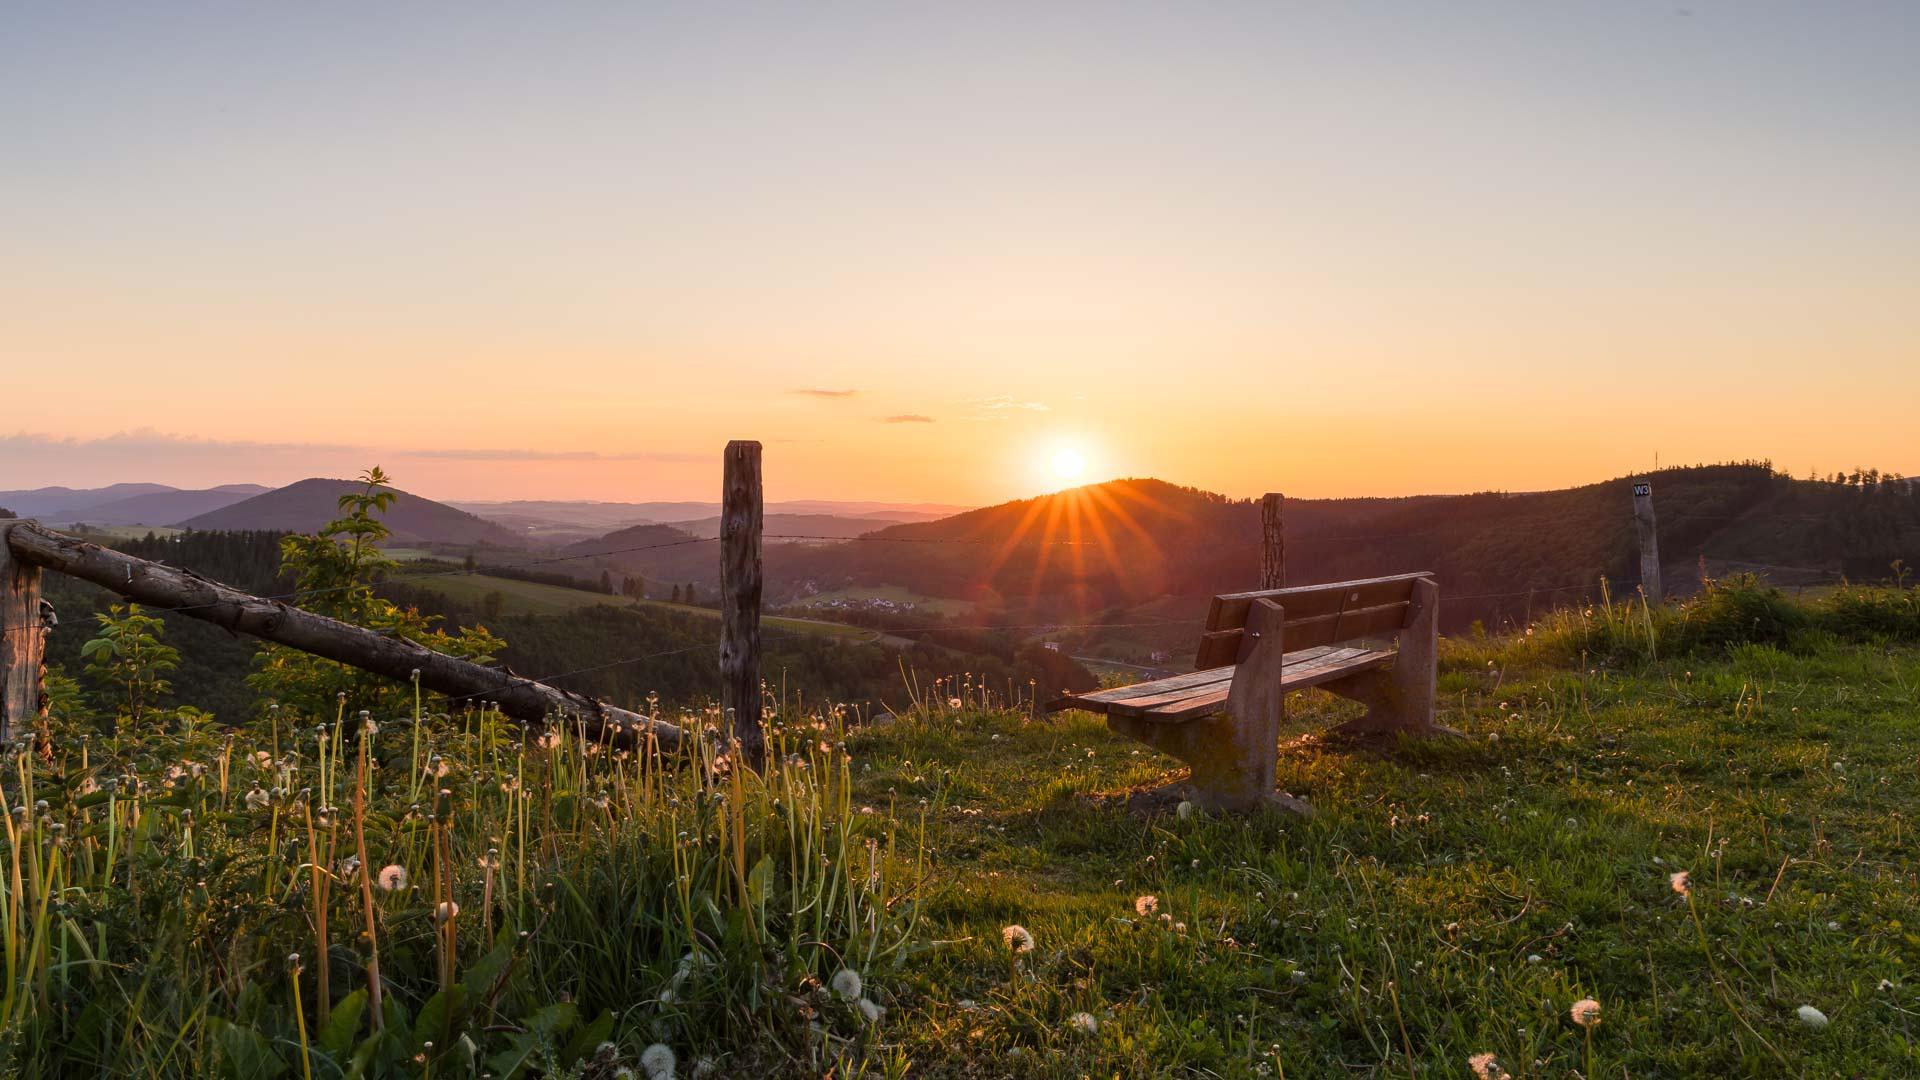 Sonnenuntergang im Lennetal